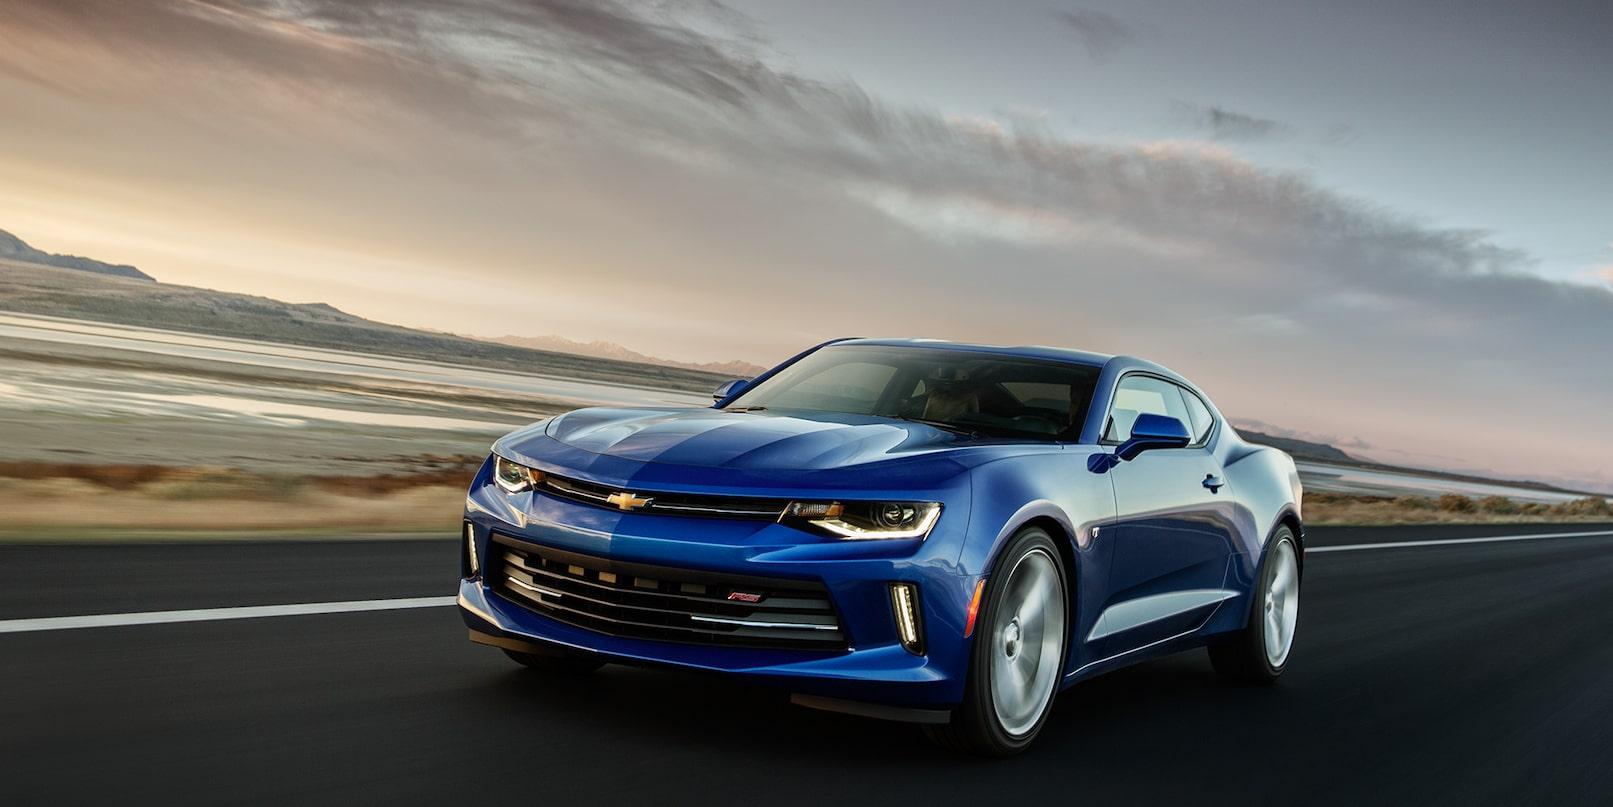 Chevrolet Camaro Lease Deals & Price - Cincinnati OH